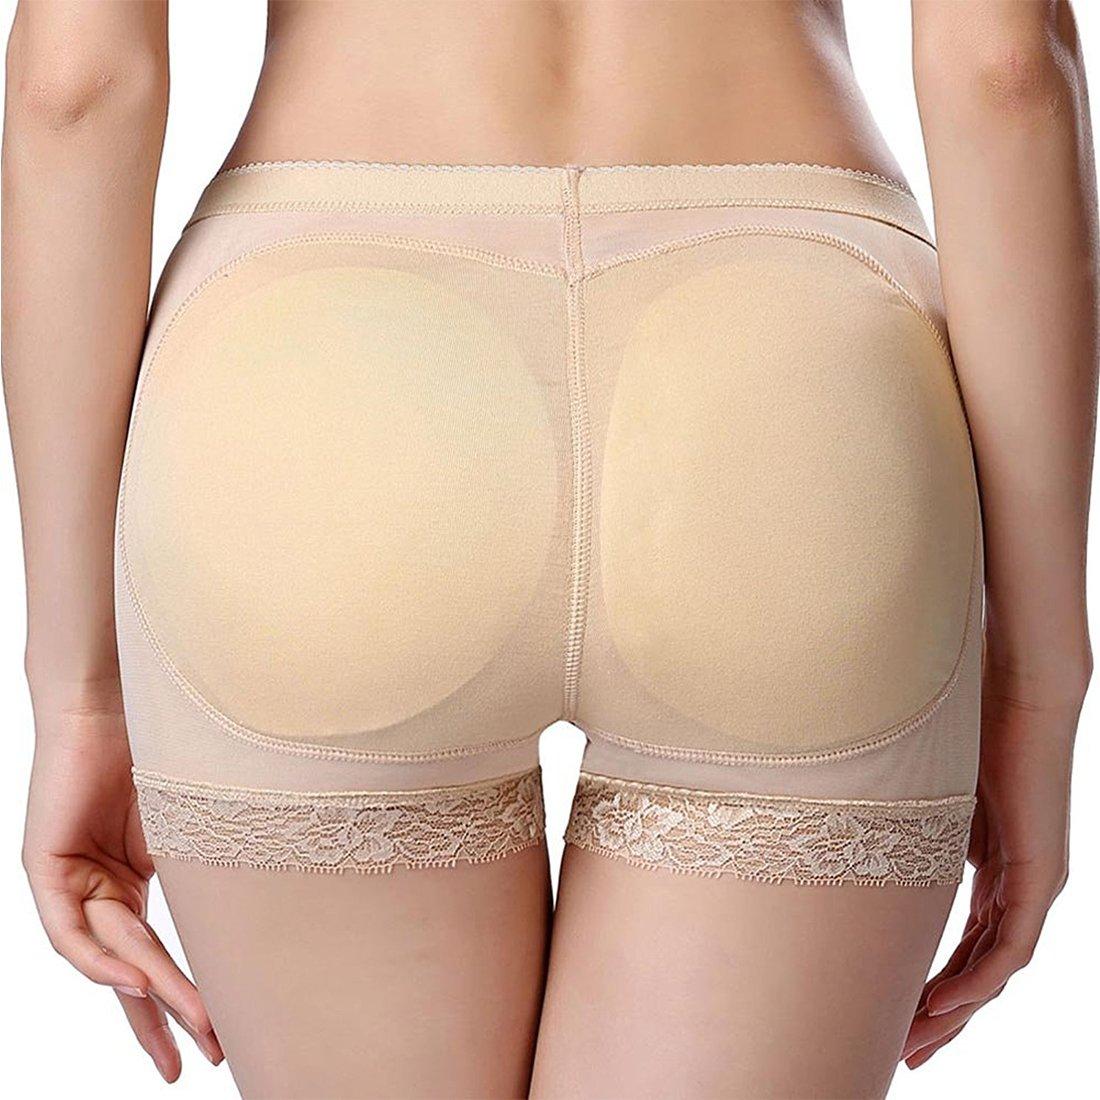 GWELL Frauen Push up Shapewear Unterhose Padded Nahtlos Figurformende Miederslip Sommer